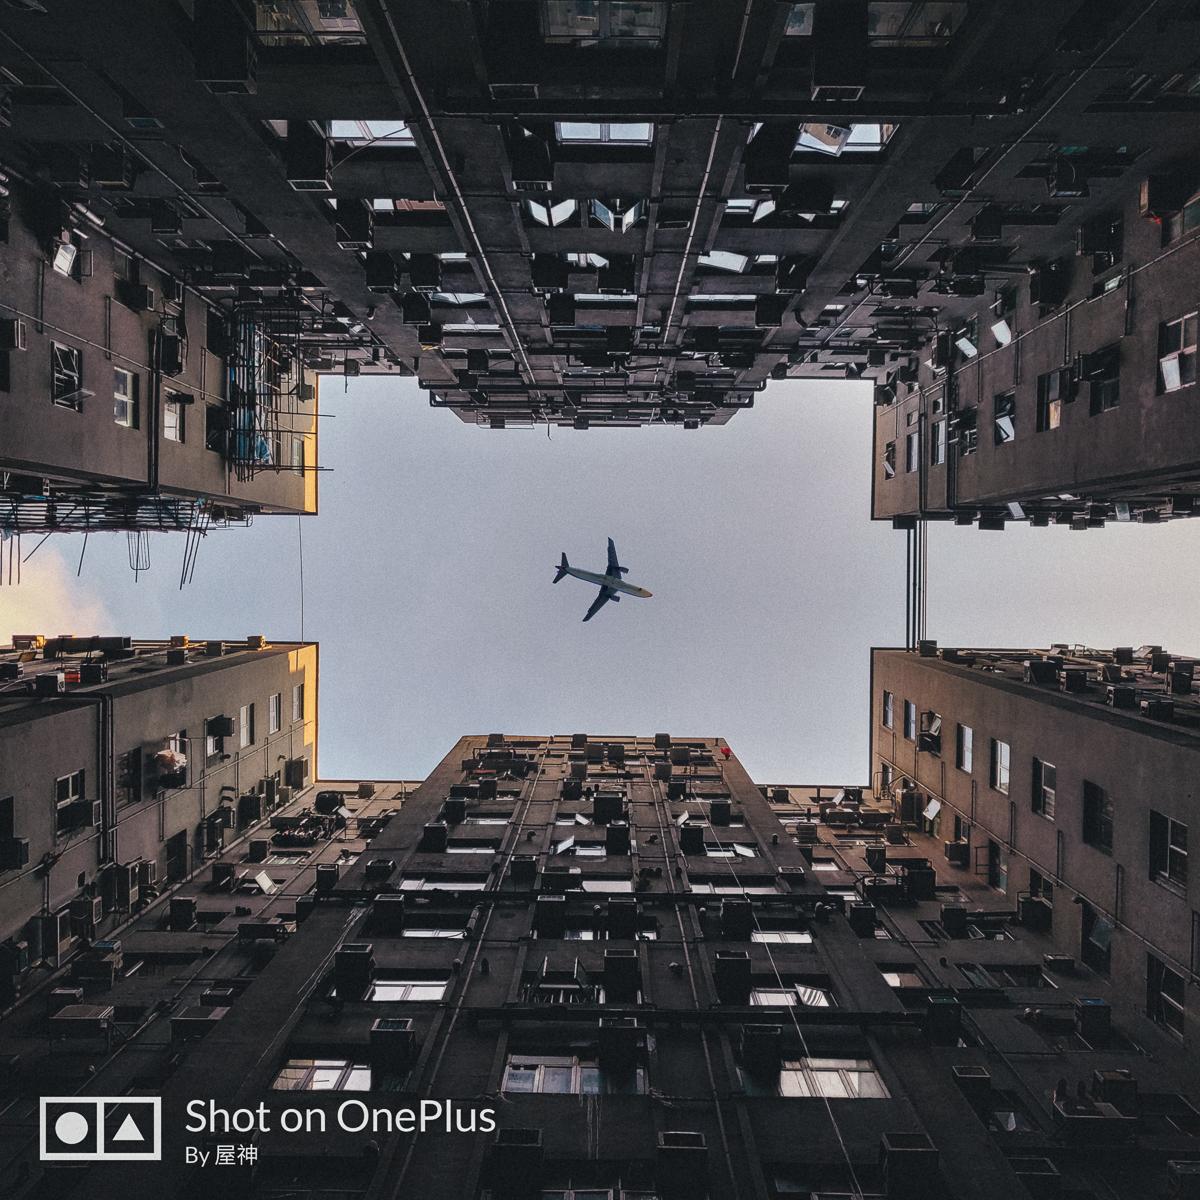 HK-001.jpg